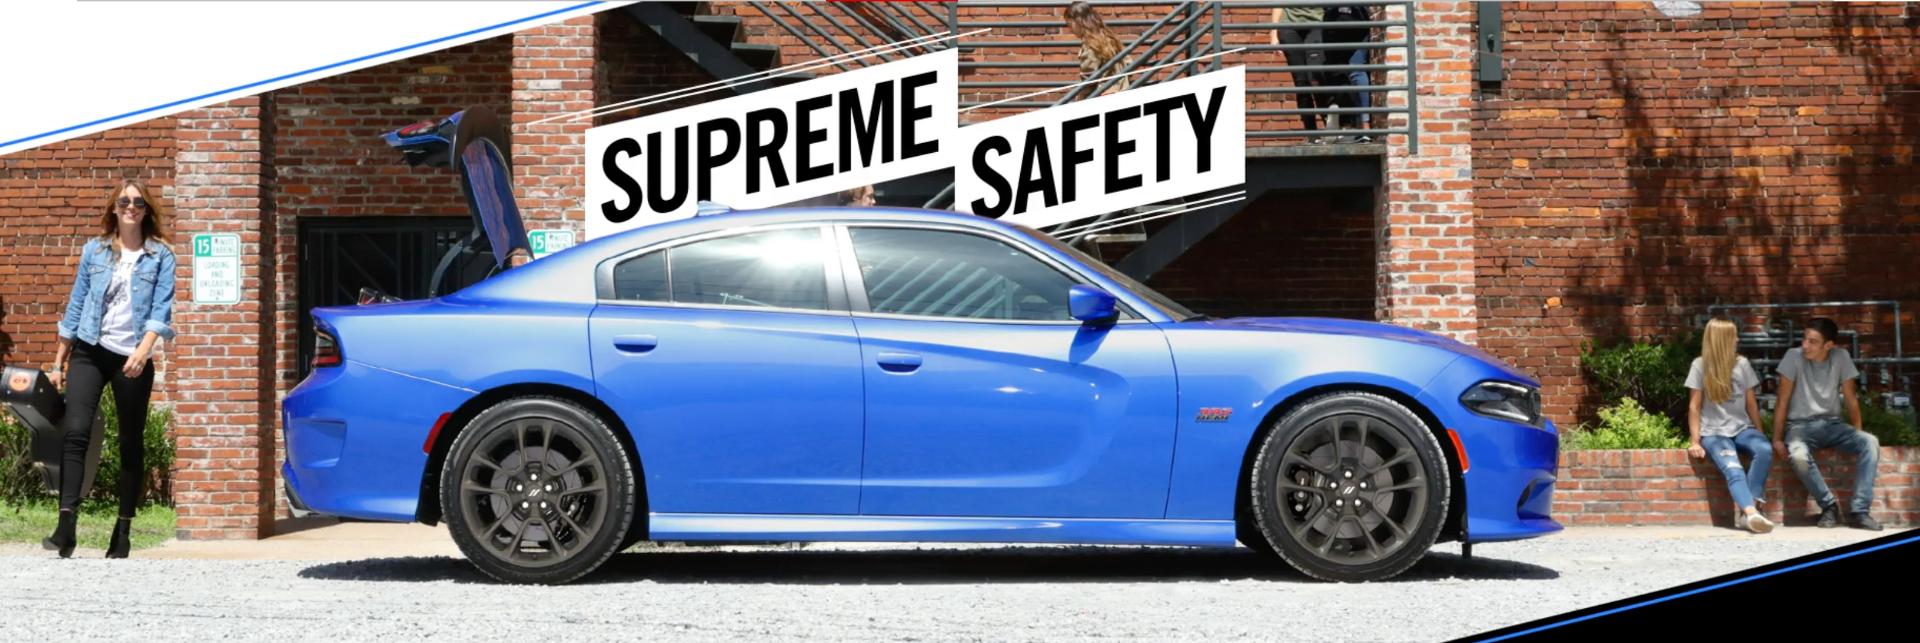 supreme safety